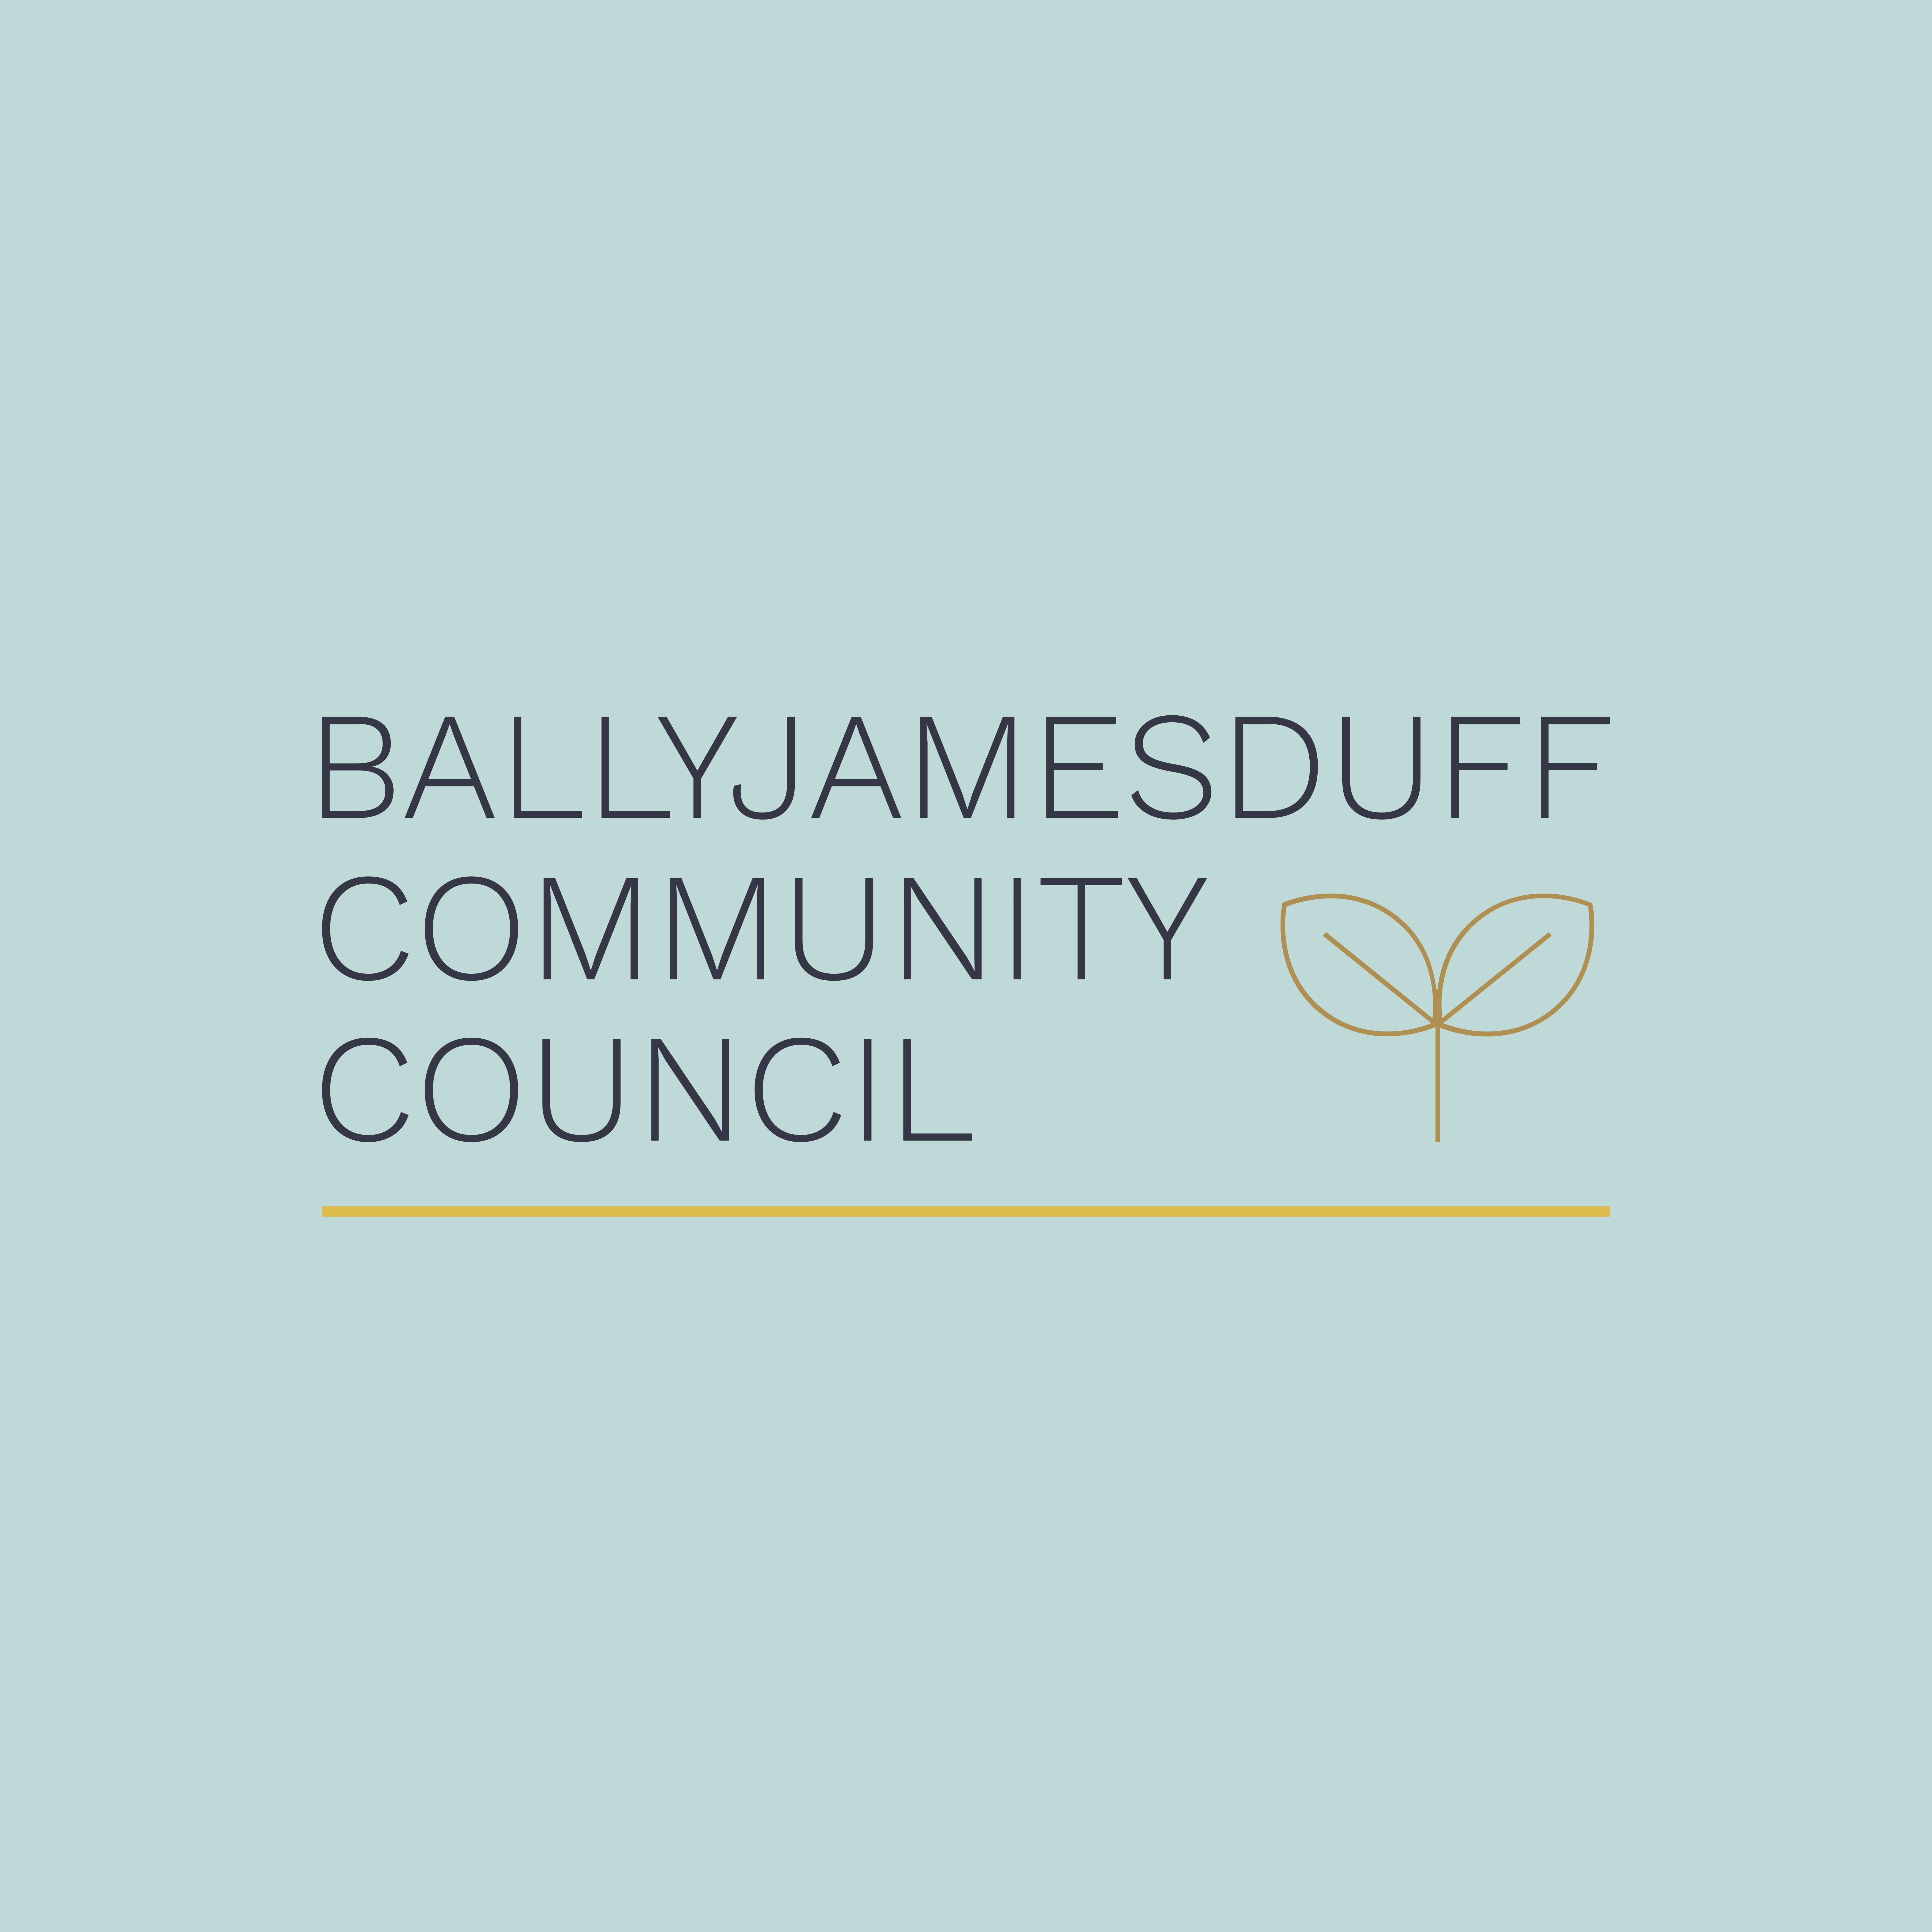 Ballyjamesduff Community Council